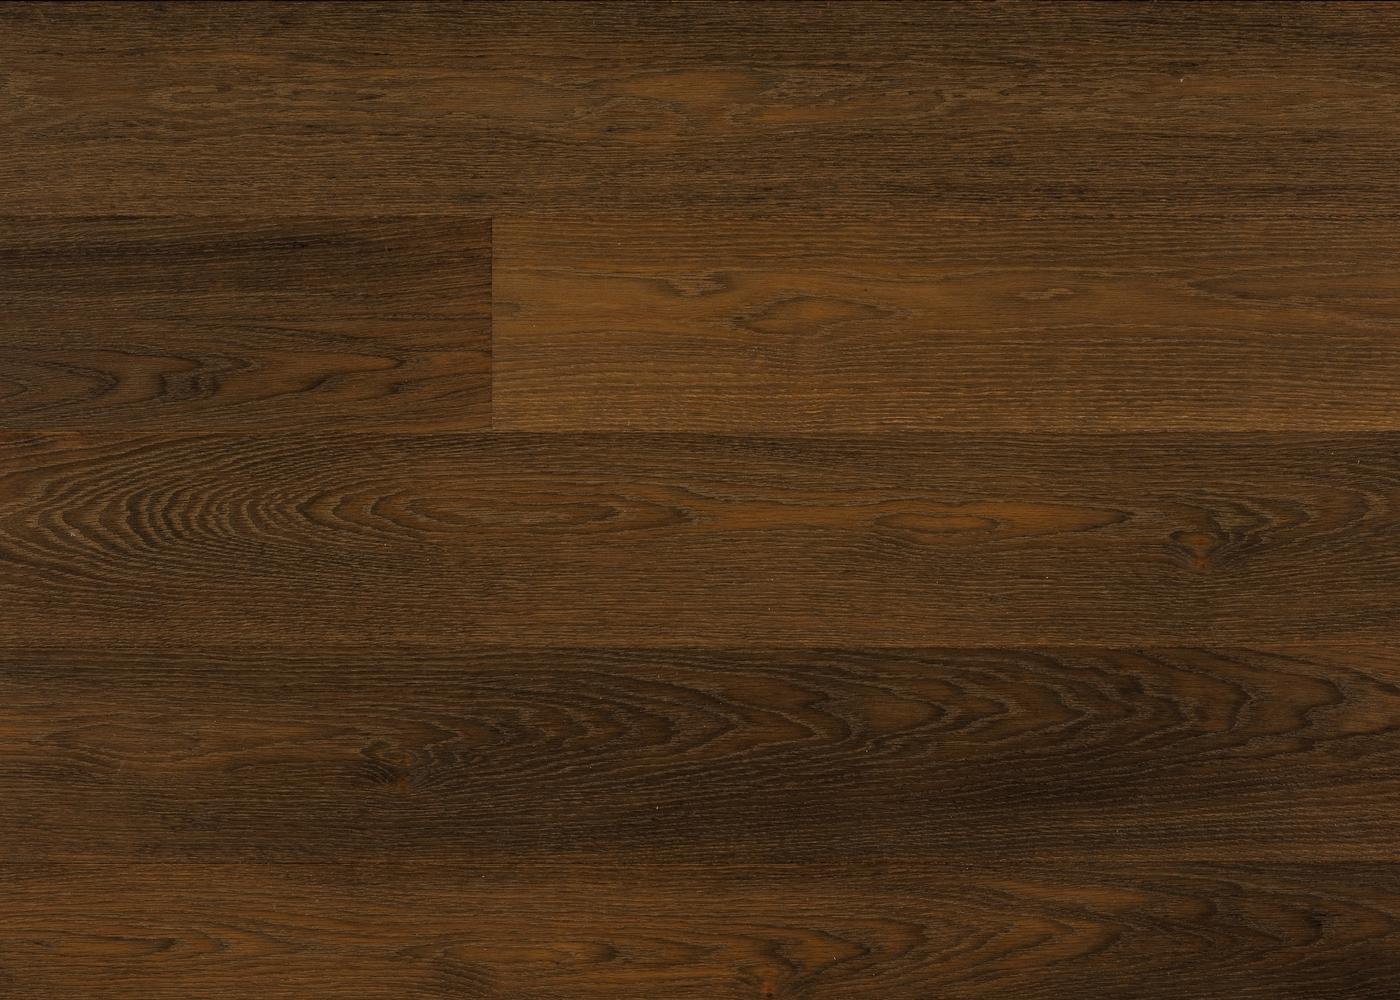 Parquet chêne contrecollé MELBOURNE vernis aqua ultra mat PRBis 14x148x2200